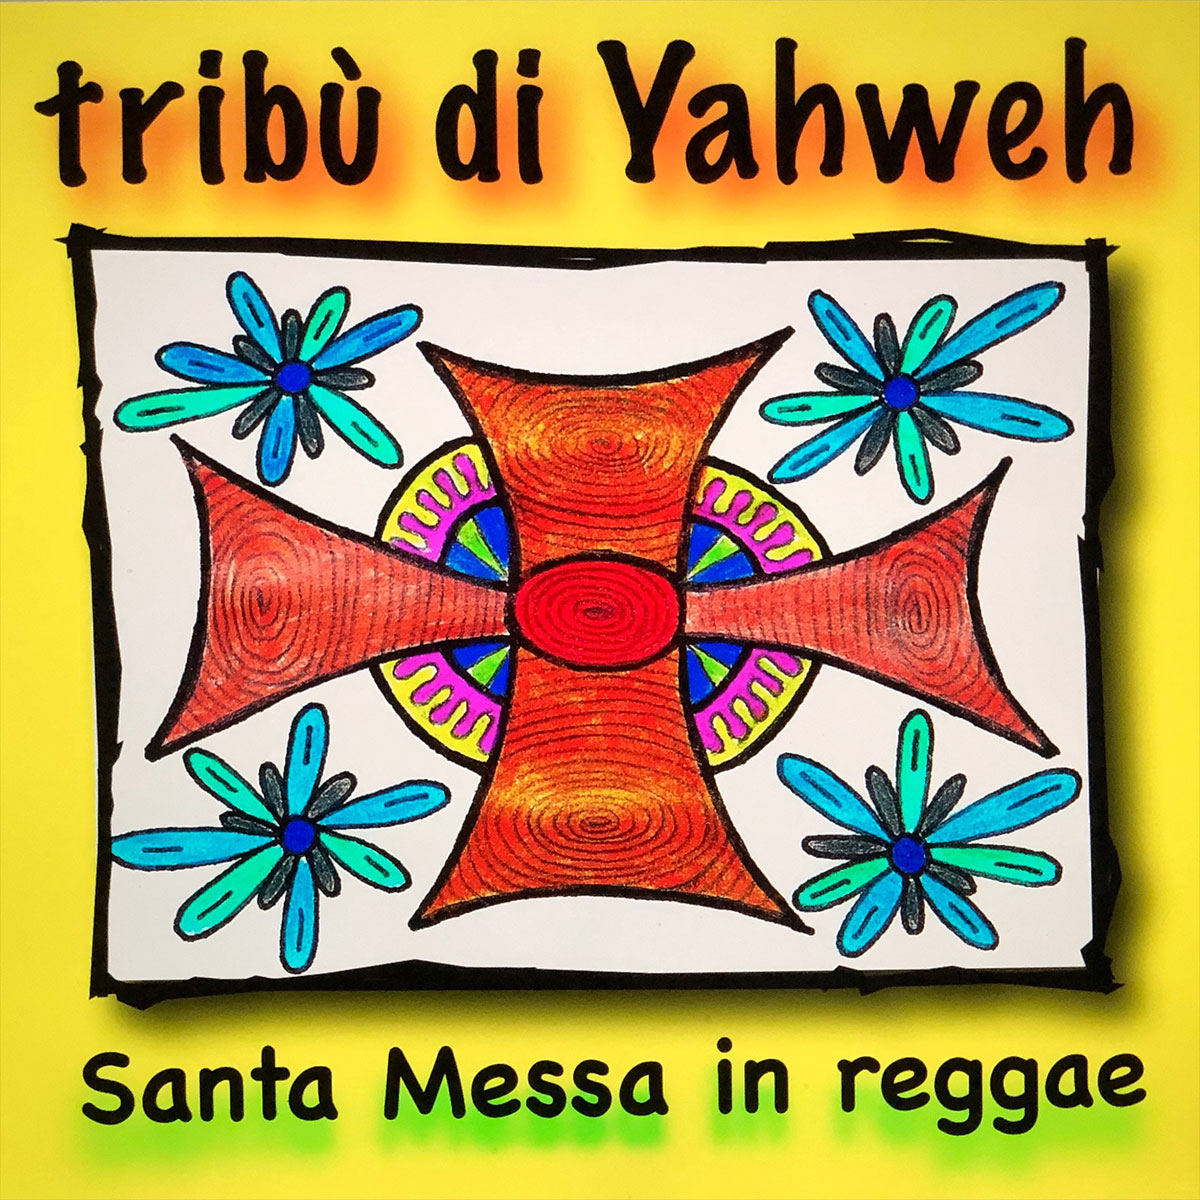 https://www.tribudiyahweh.com/wp/wp-content/uploads/2019/02/Santa-Messa-in-reggae.jpg